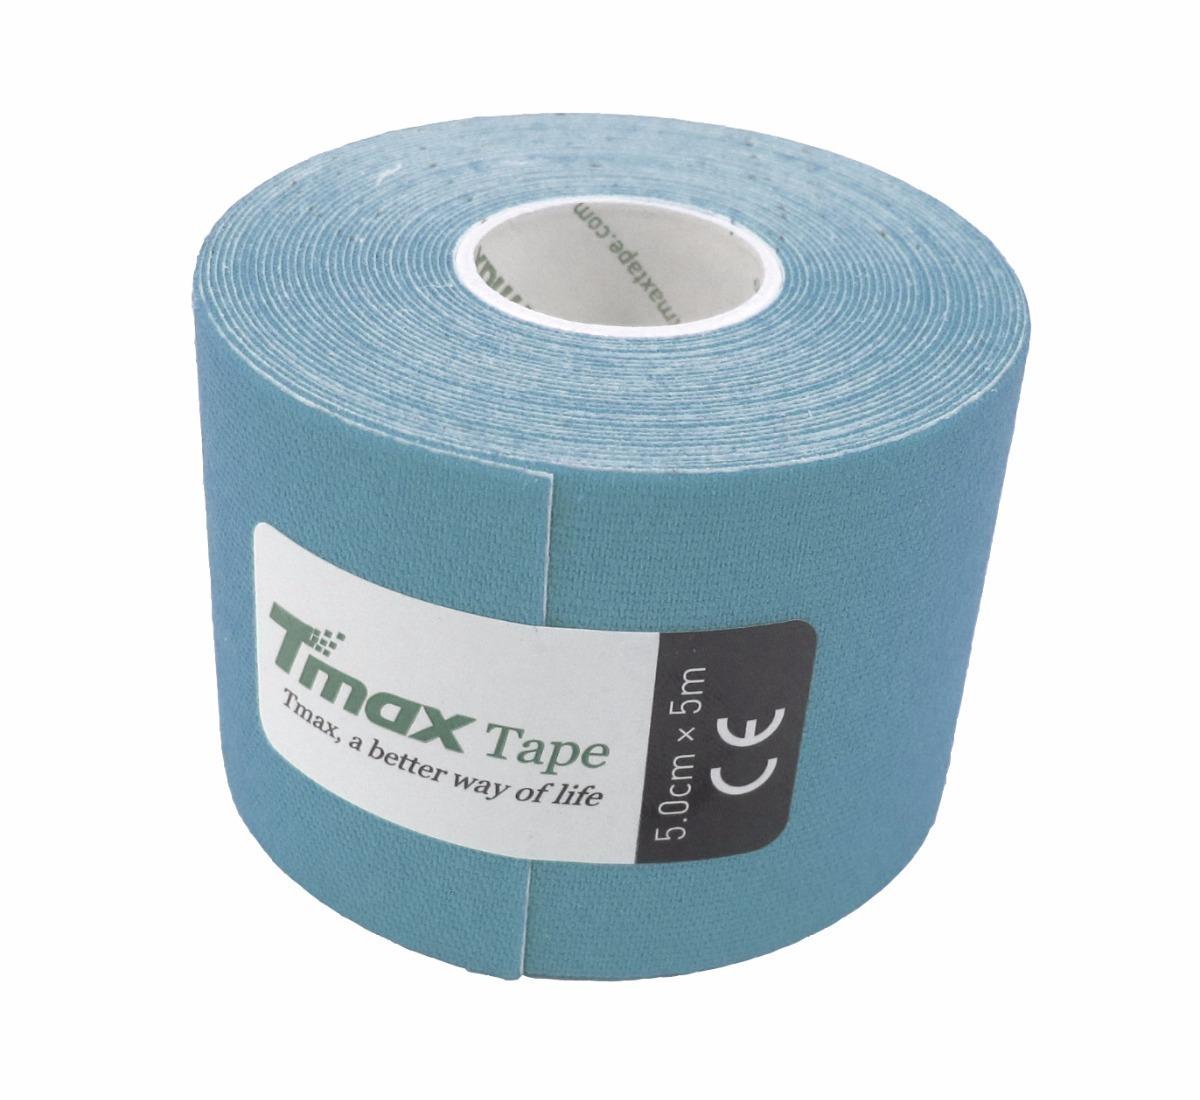 535d8e8fe9 Fita Kinesio Tmax Multilaser Bandagem Elastica 5 Mt Azul - R  33